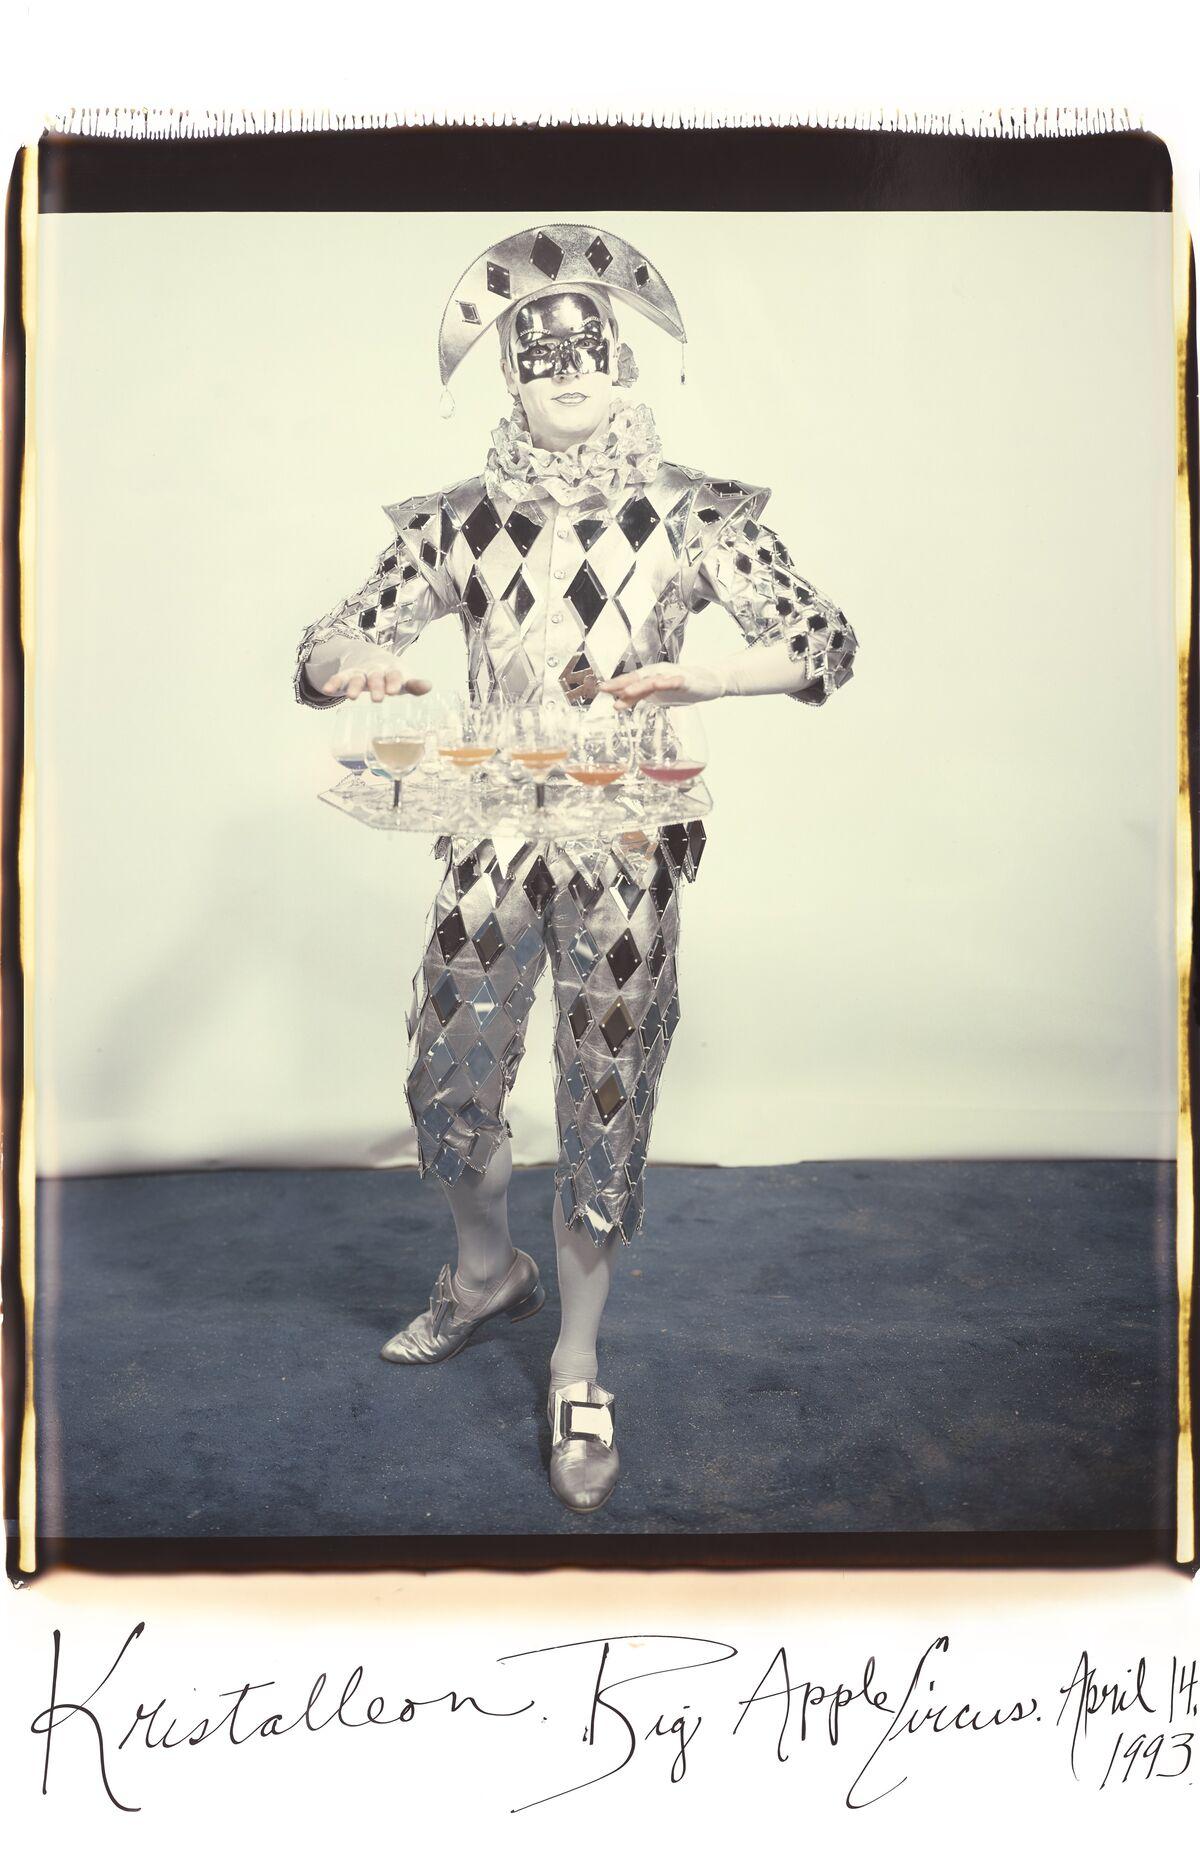 Elsa Dorfman, Kristalleon Big Apple Circus, 1993. Courtesy of the artist.